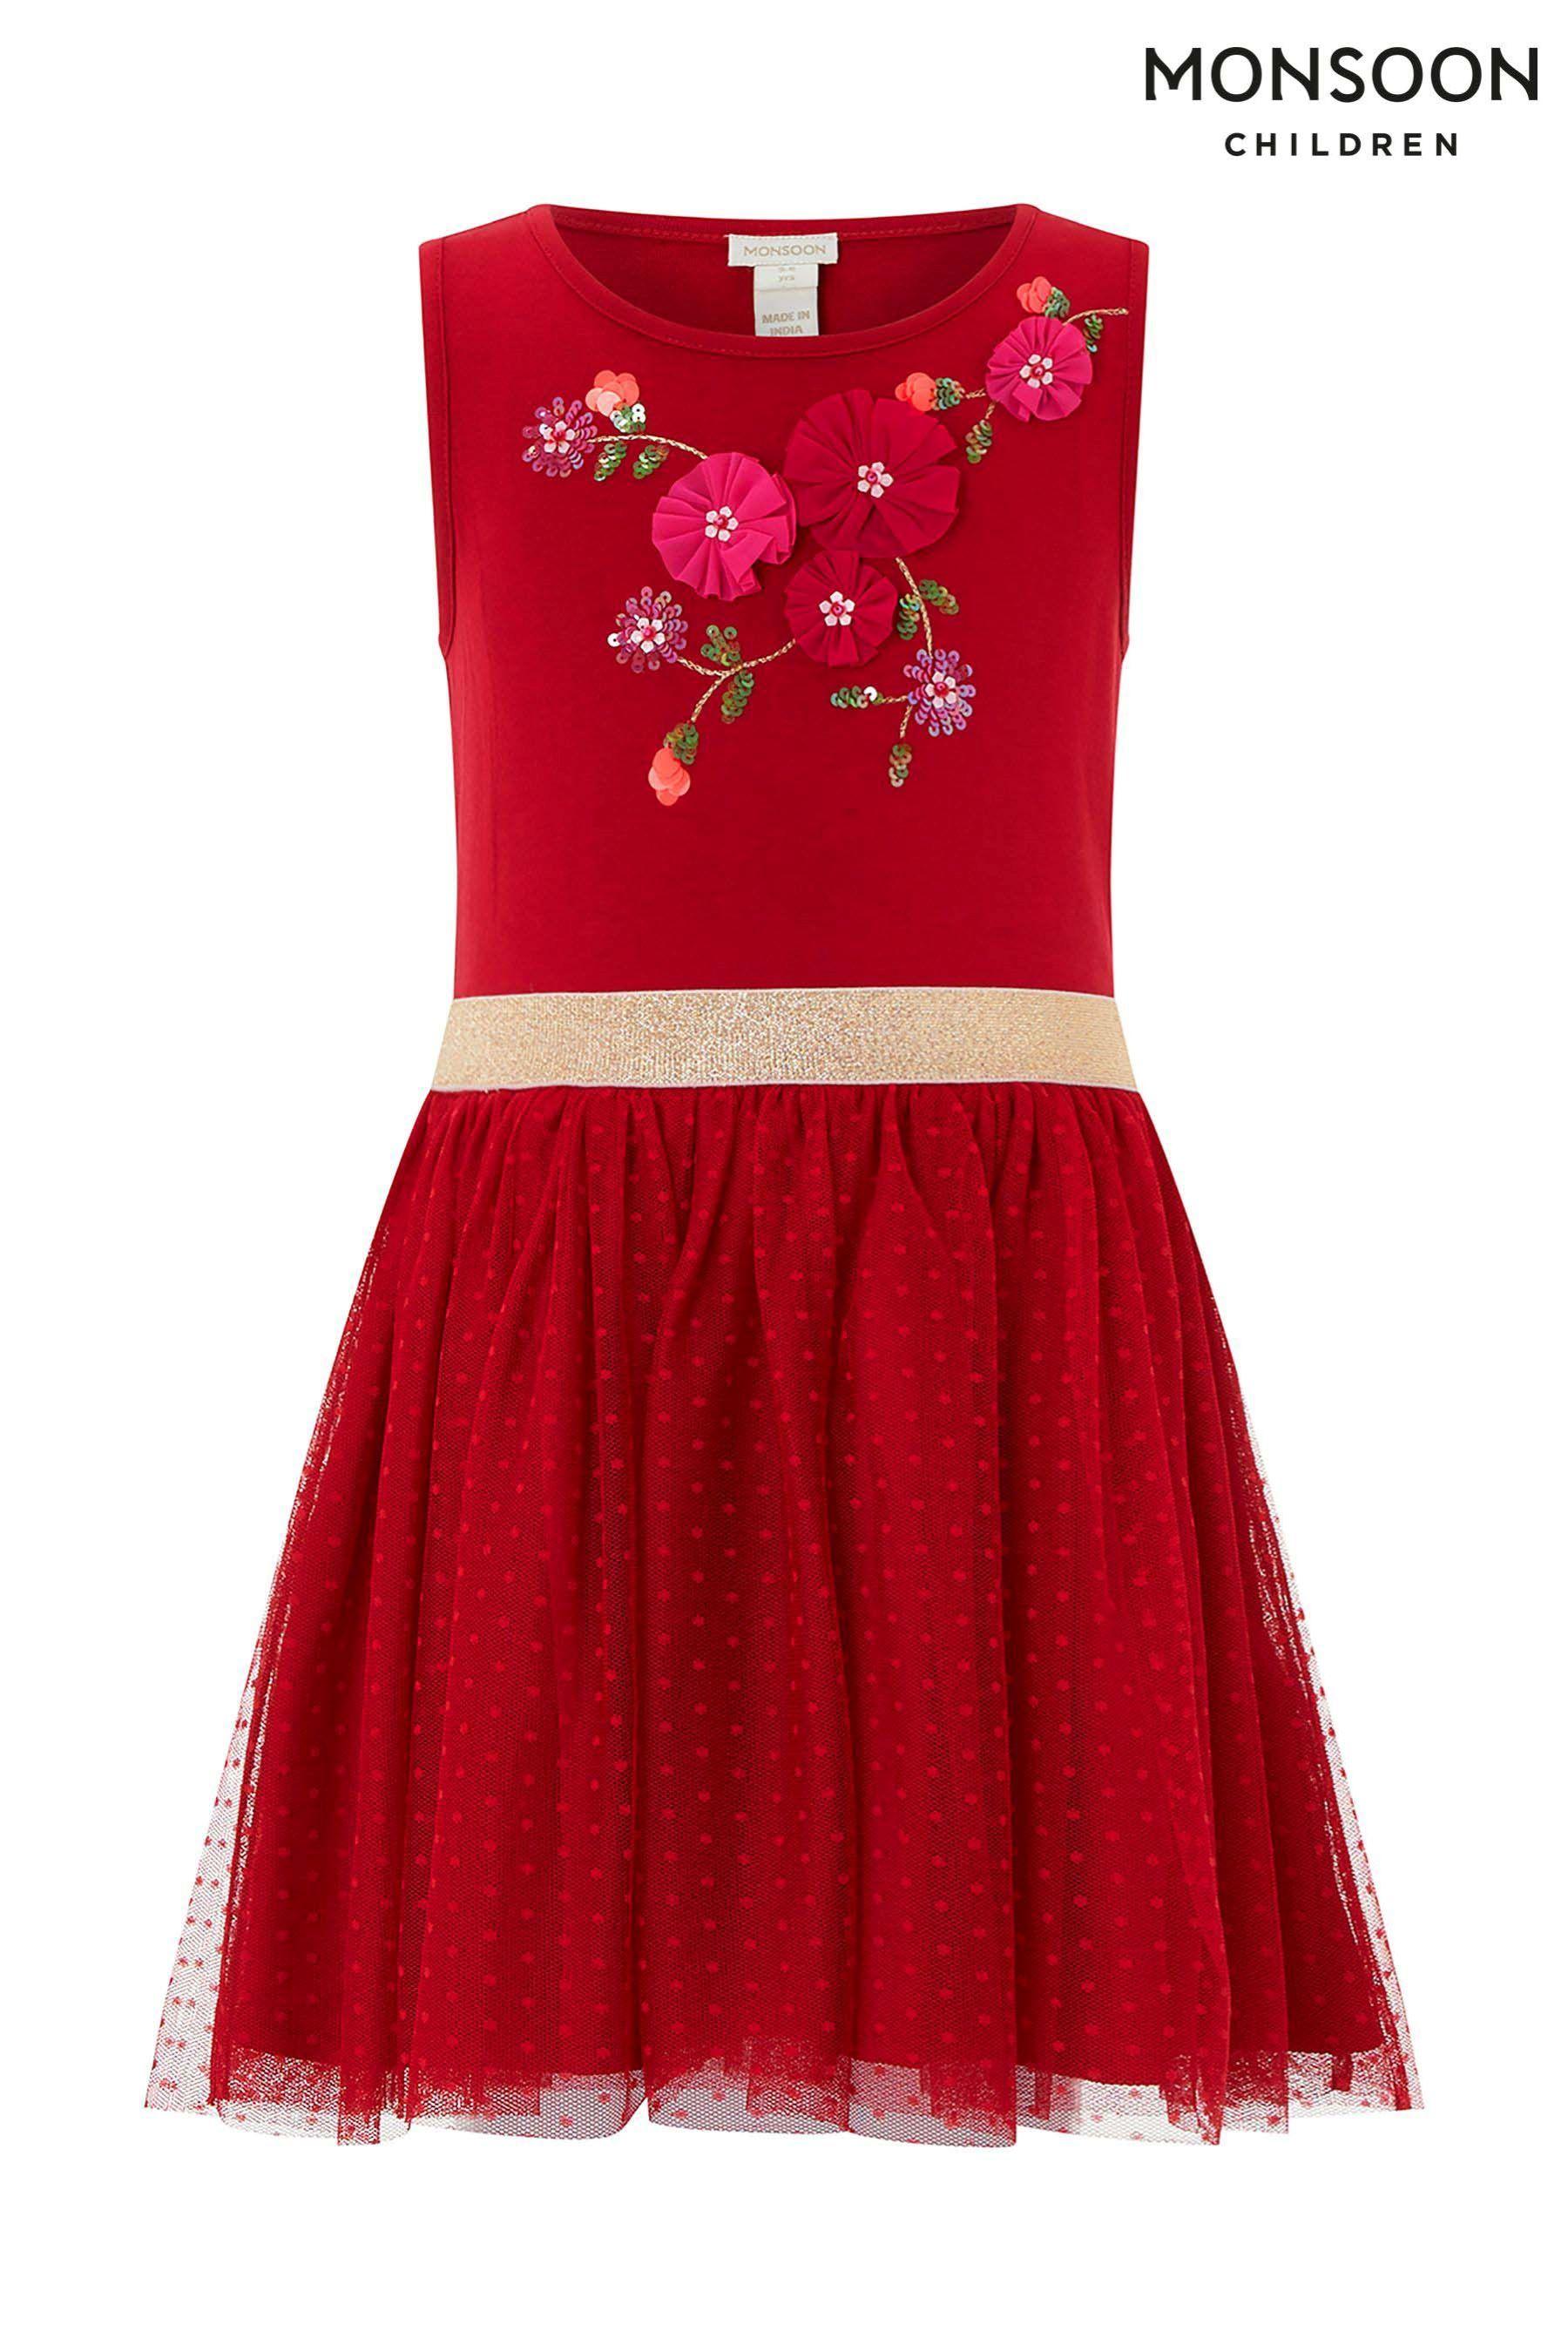 63c9f48d7 Girls Monsoon Dory Dress - Red